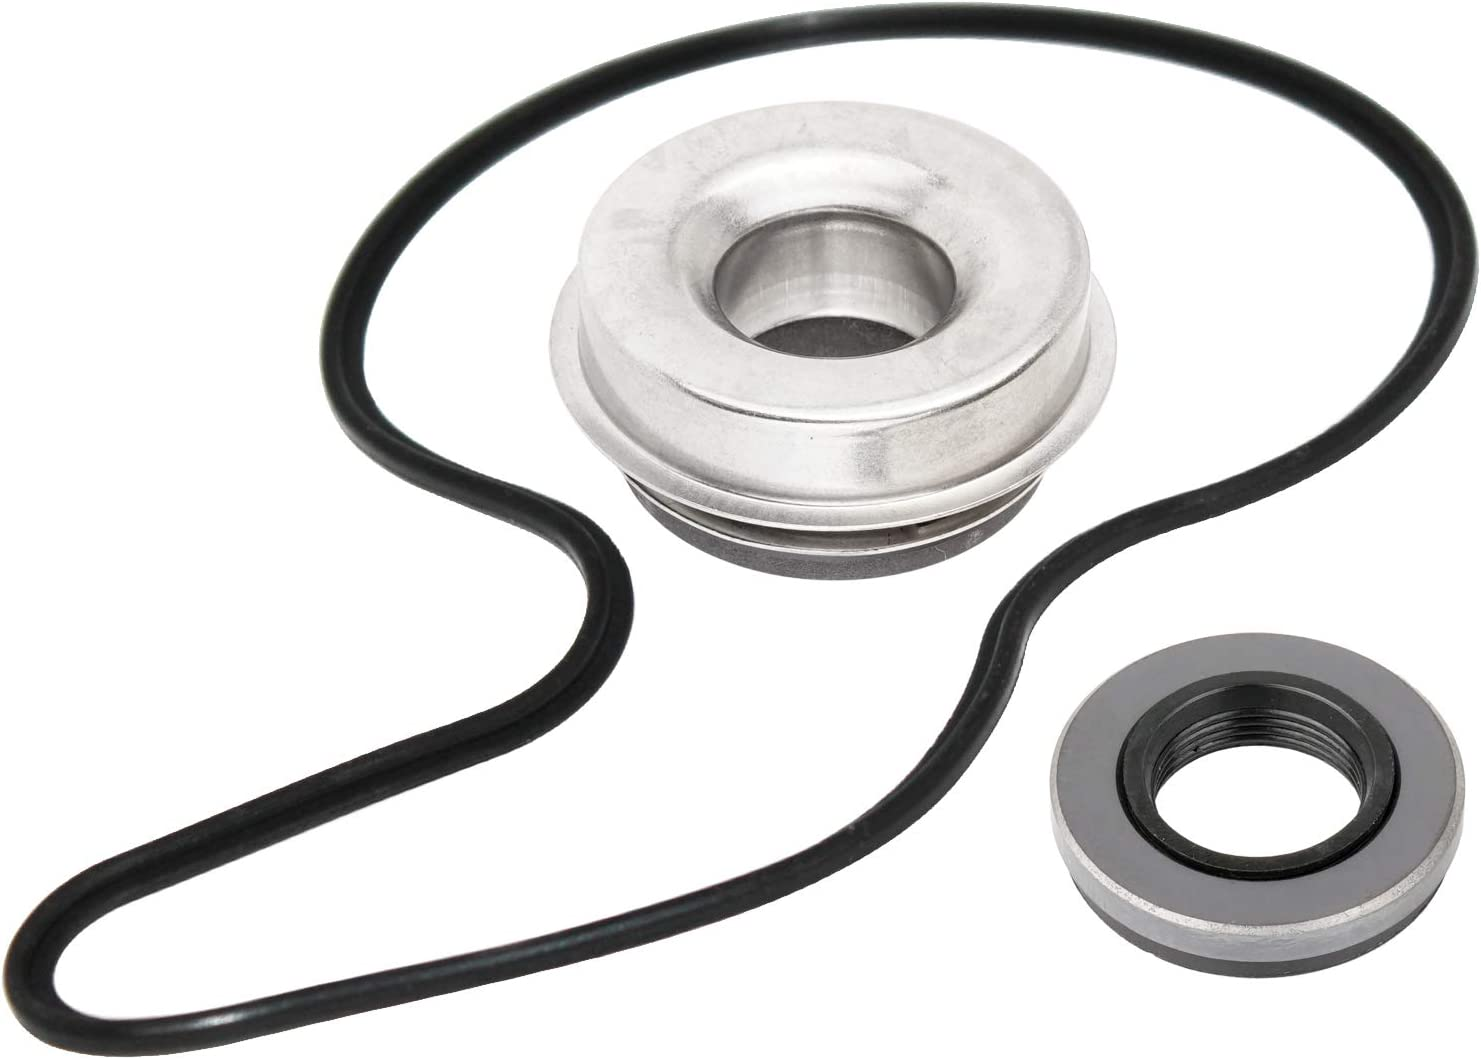 3610075 2009-2014 Mechanical Water Pump Seal Kit Polaris Sportsman 800 6x6